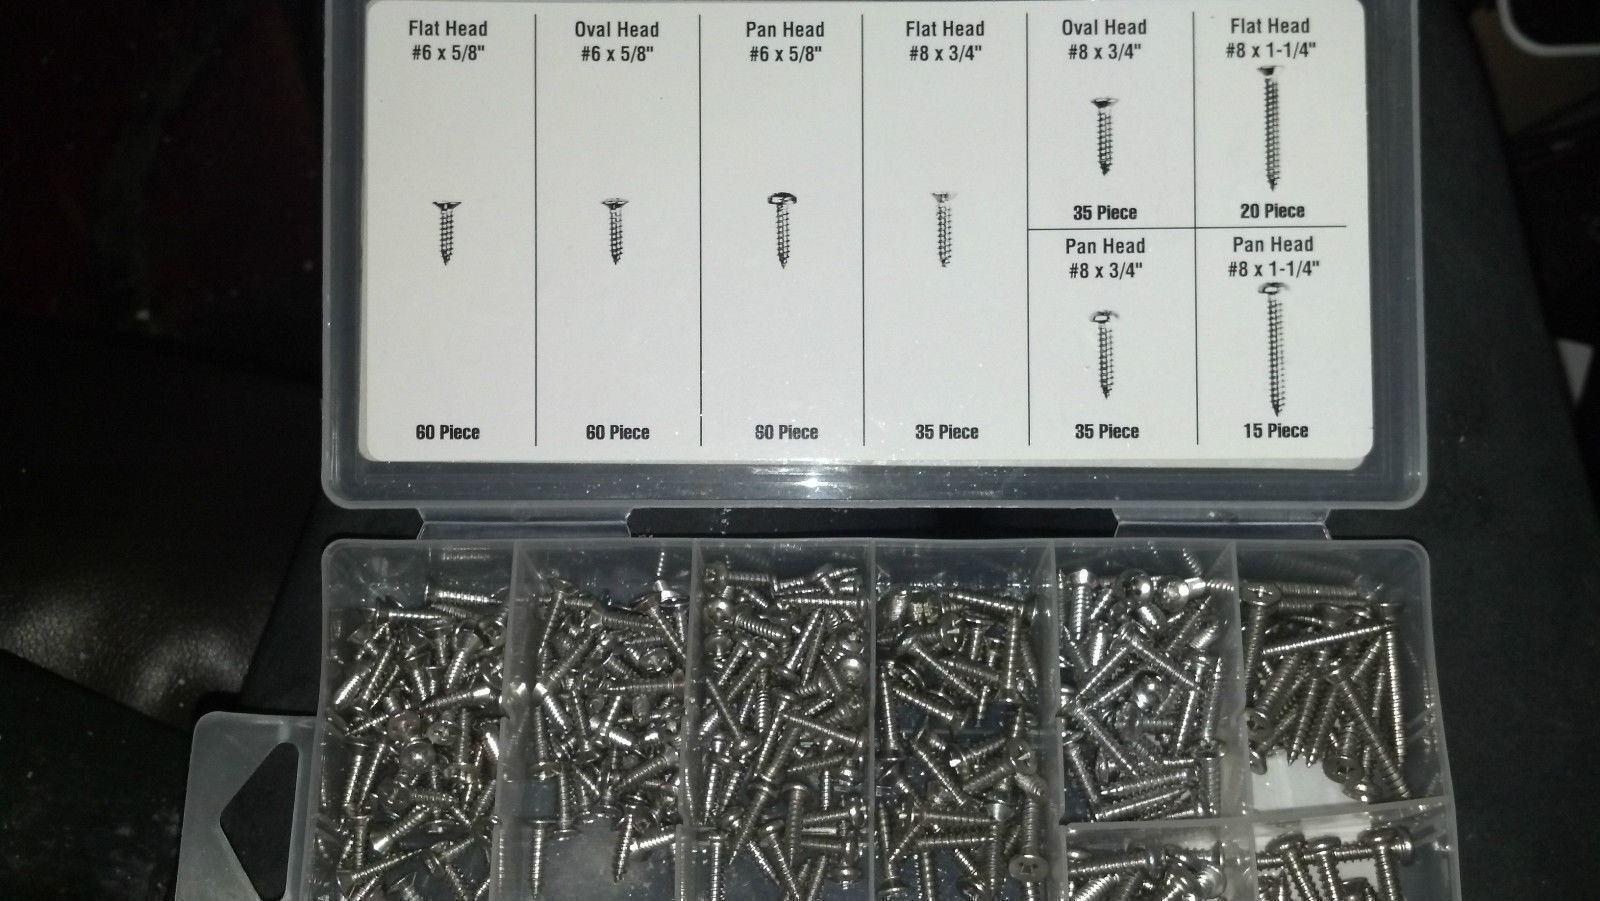 372 PIECE STAINLESS STEEL SCREW PILLAR CONSOLE DASH TRIM HEADLINER DOOR PANEL